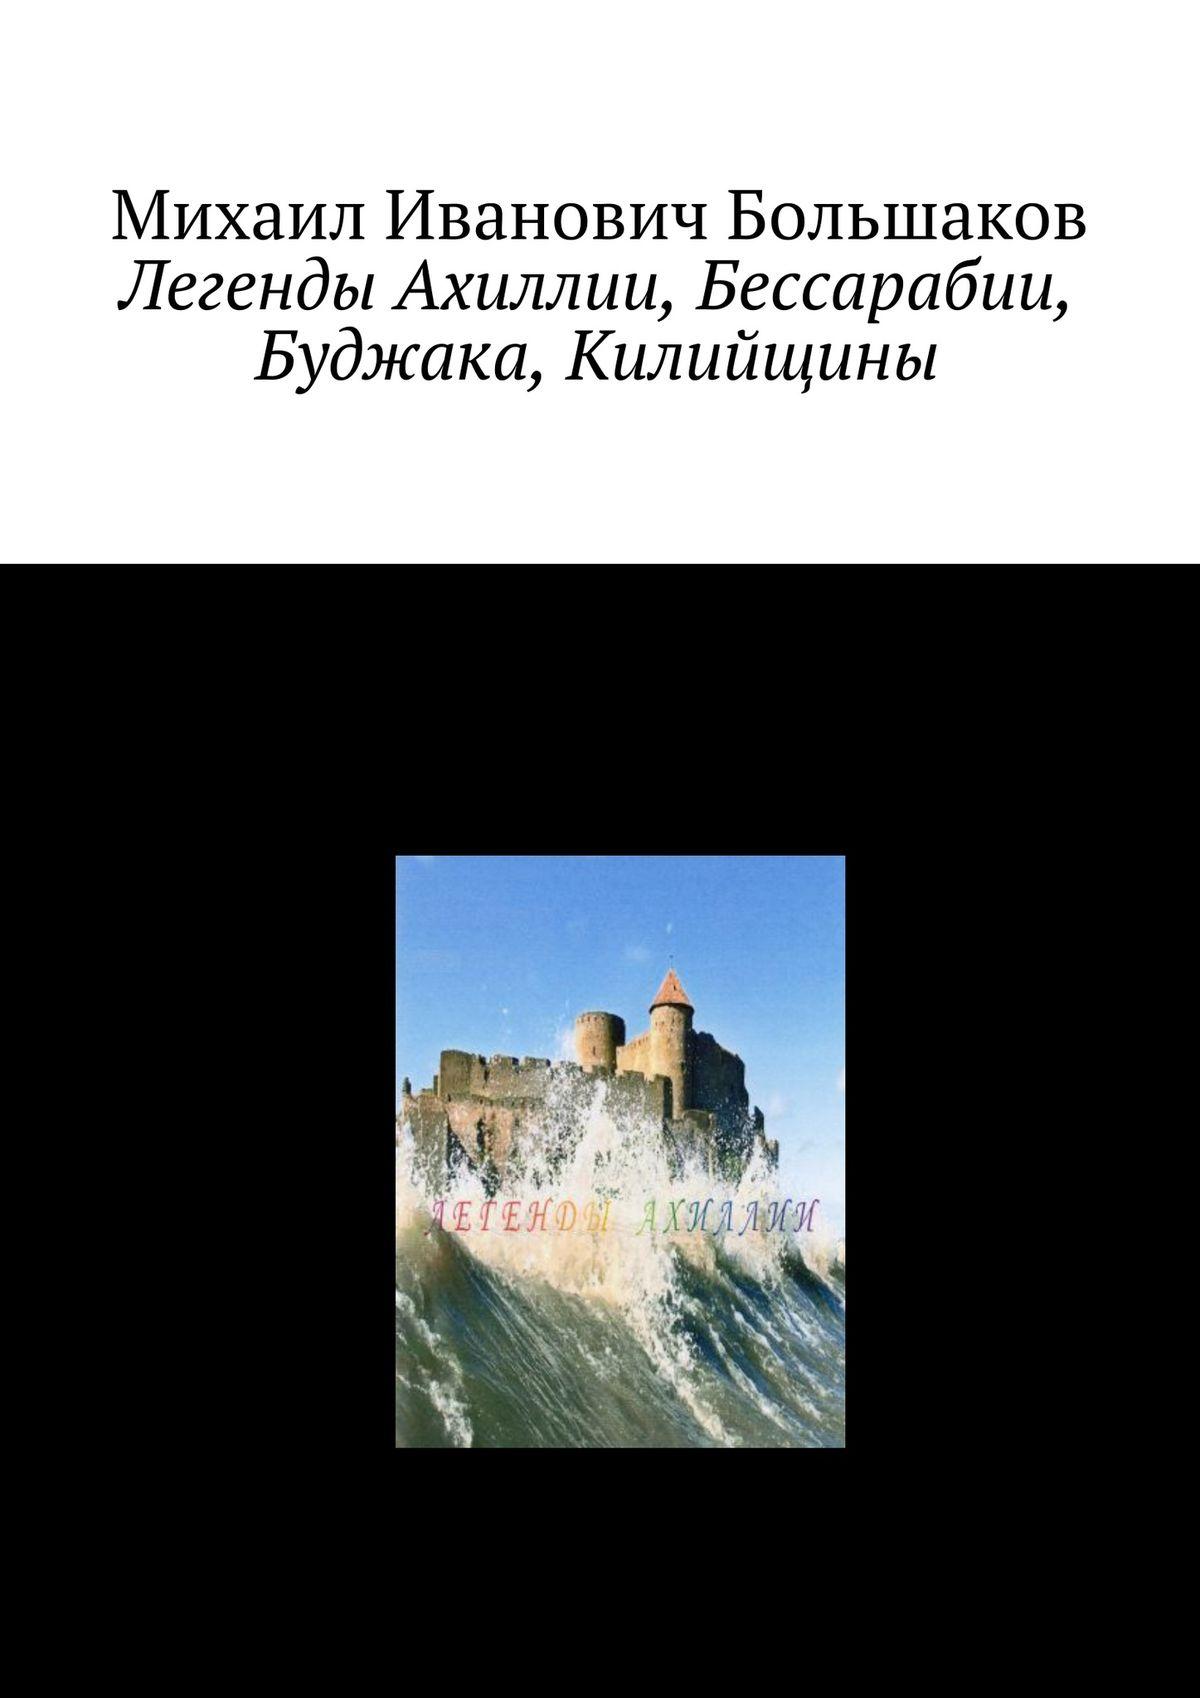 Легенды Ахиллии, Бессарабии, Буджака, Килийщины